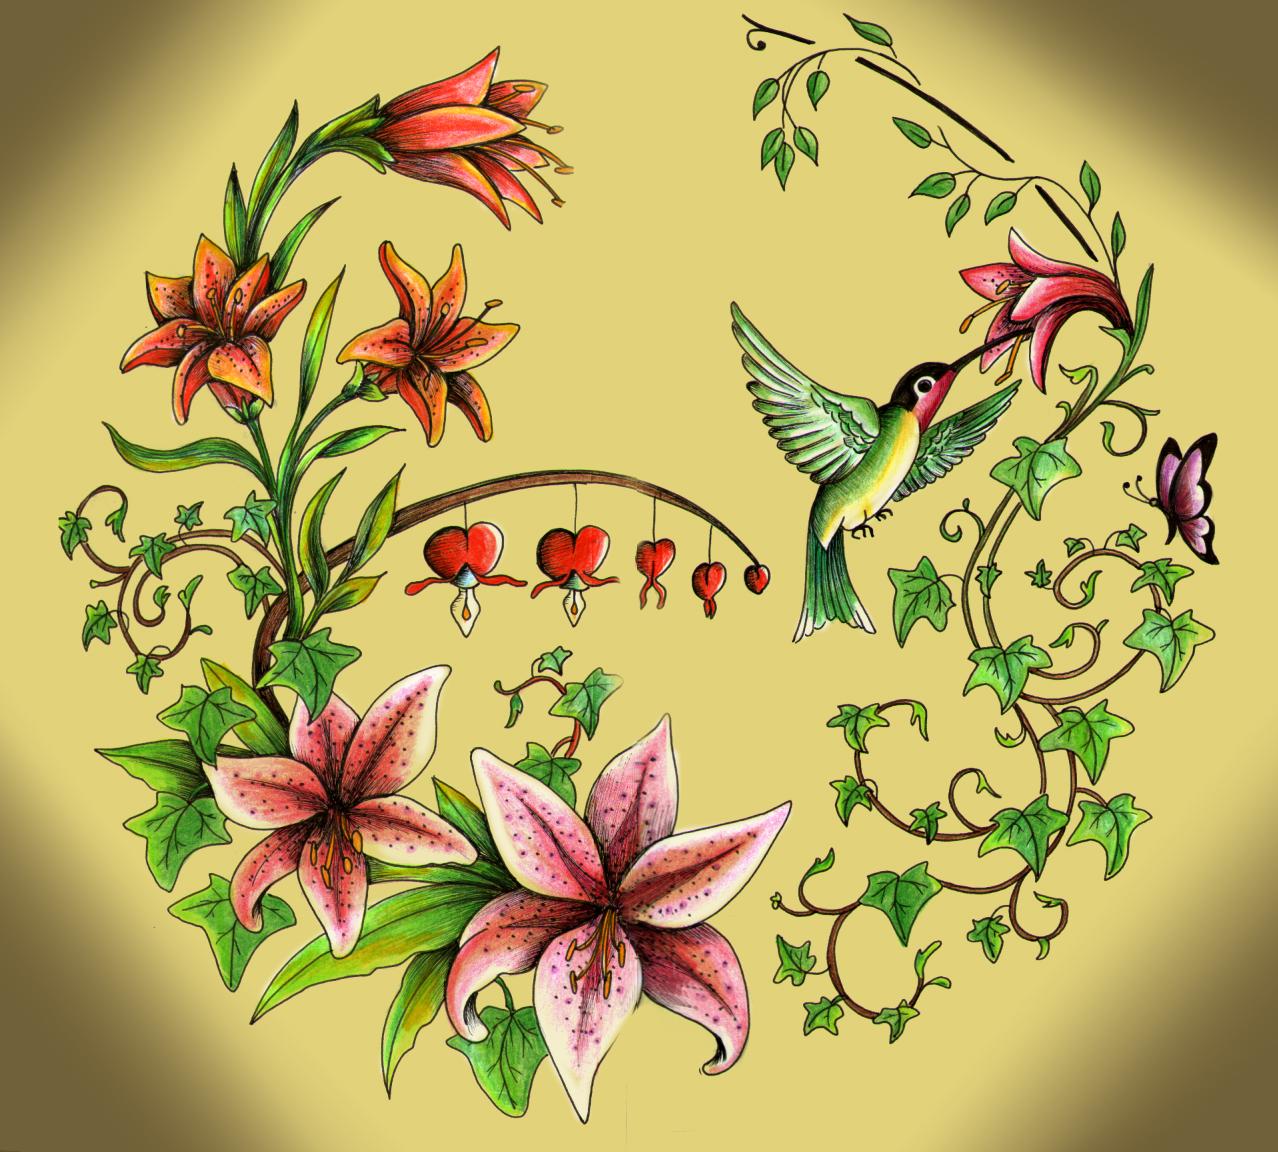 Flores - Imagens e Fotos para Facebook, Pinterest, Whatsapp